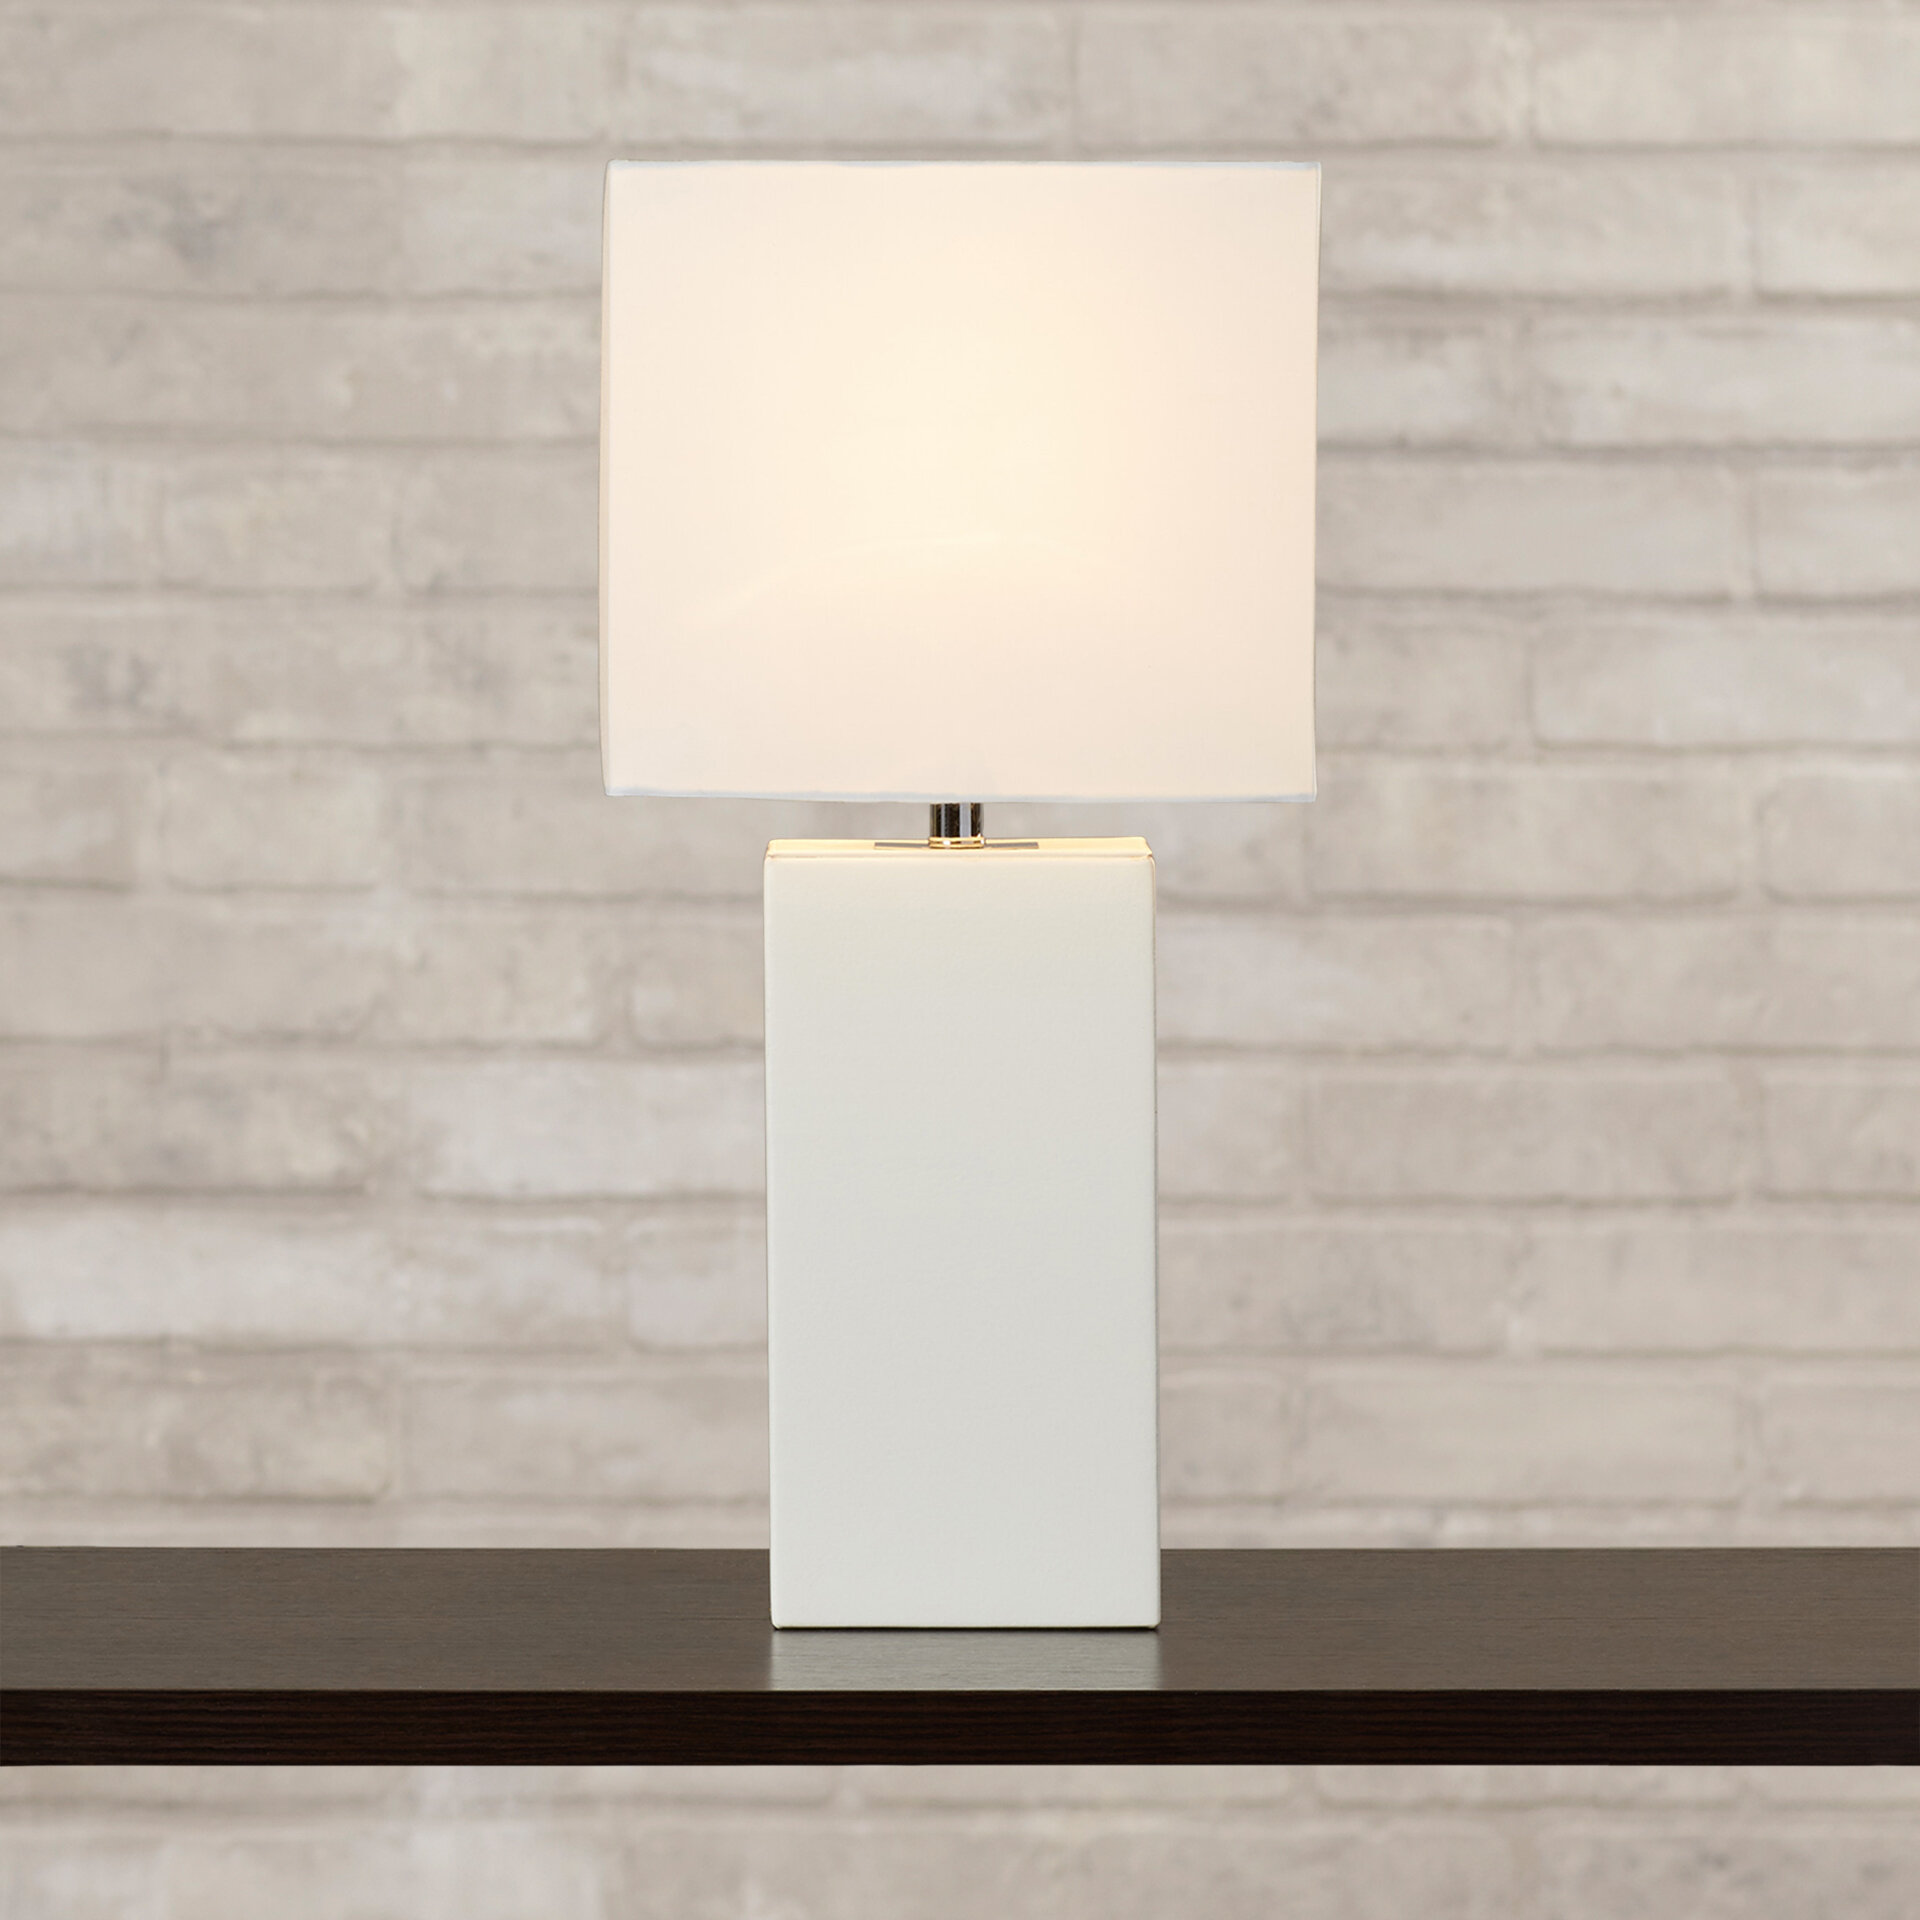 Best Secret Table Lamps Toronto Site @house2homegoods.net